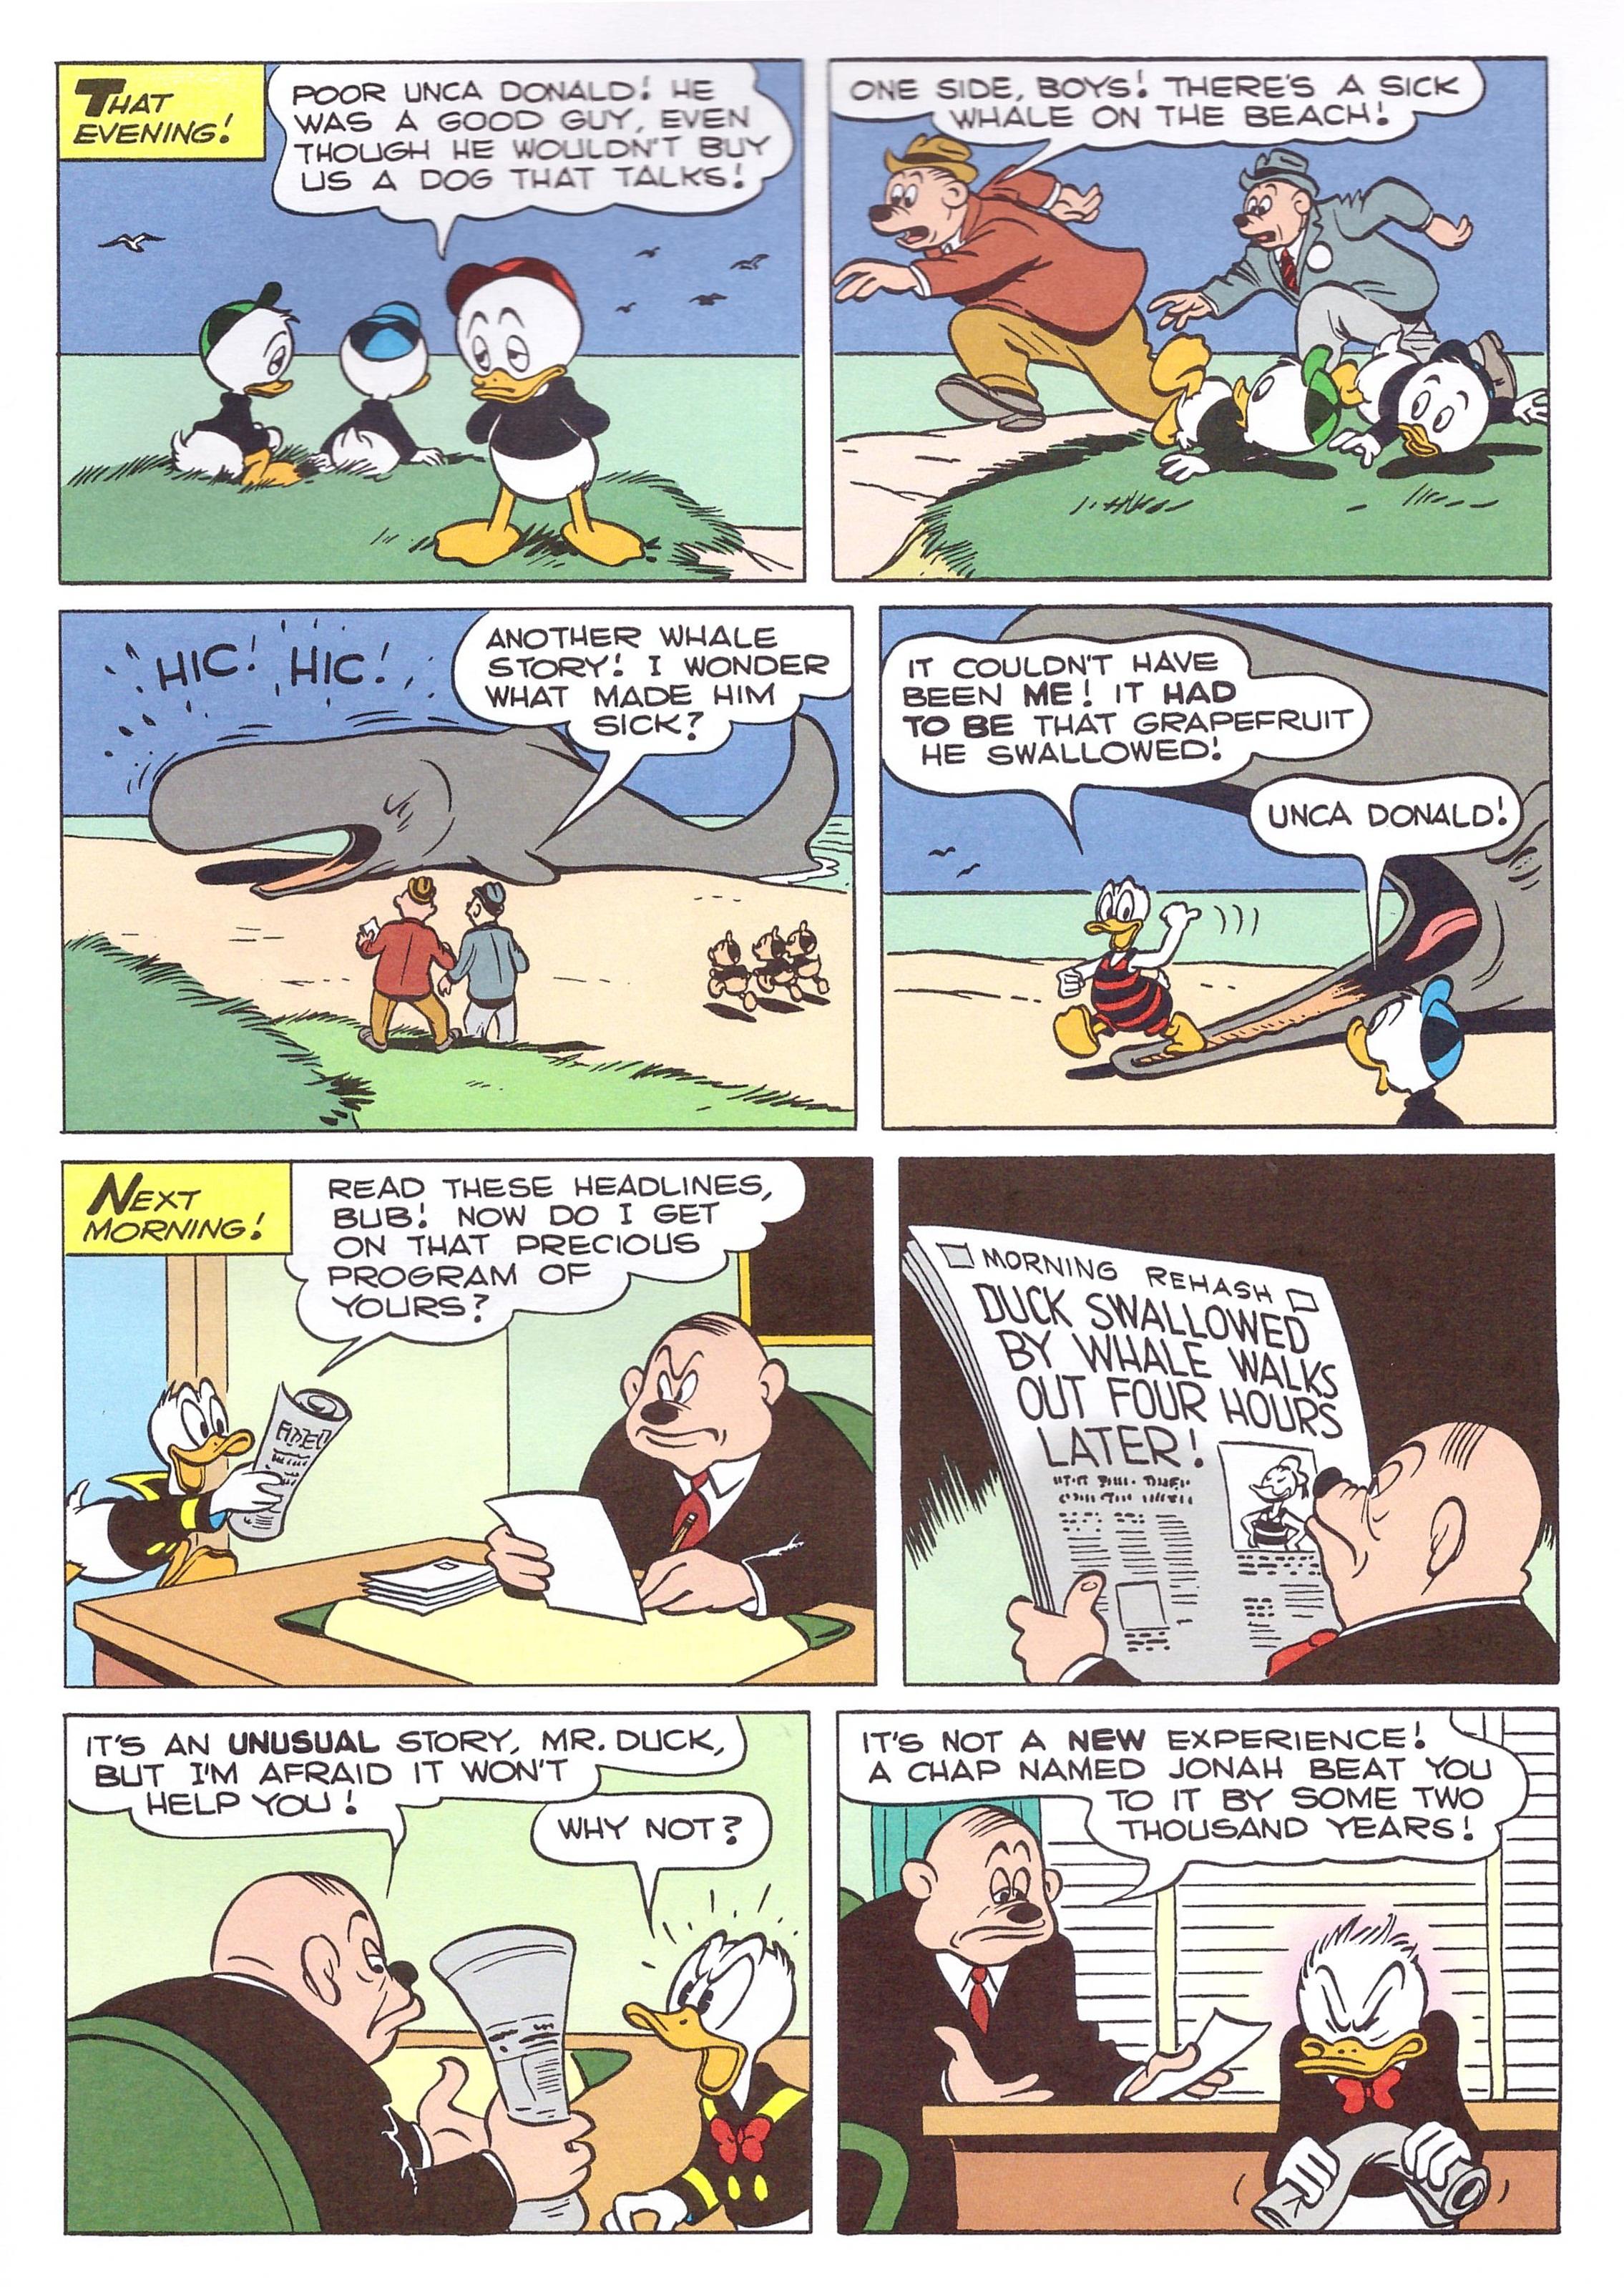 Walt Disney Comics & Stories by Carl Barks 23 review